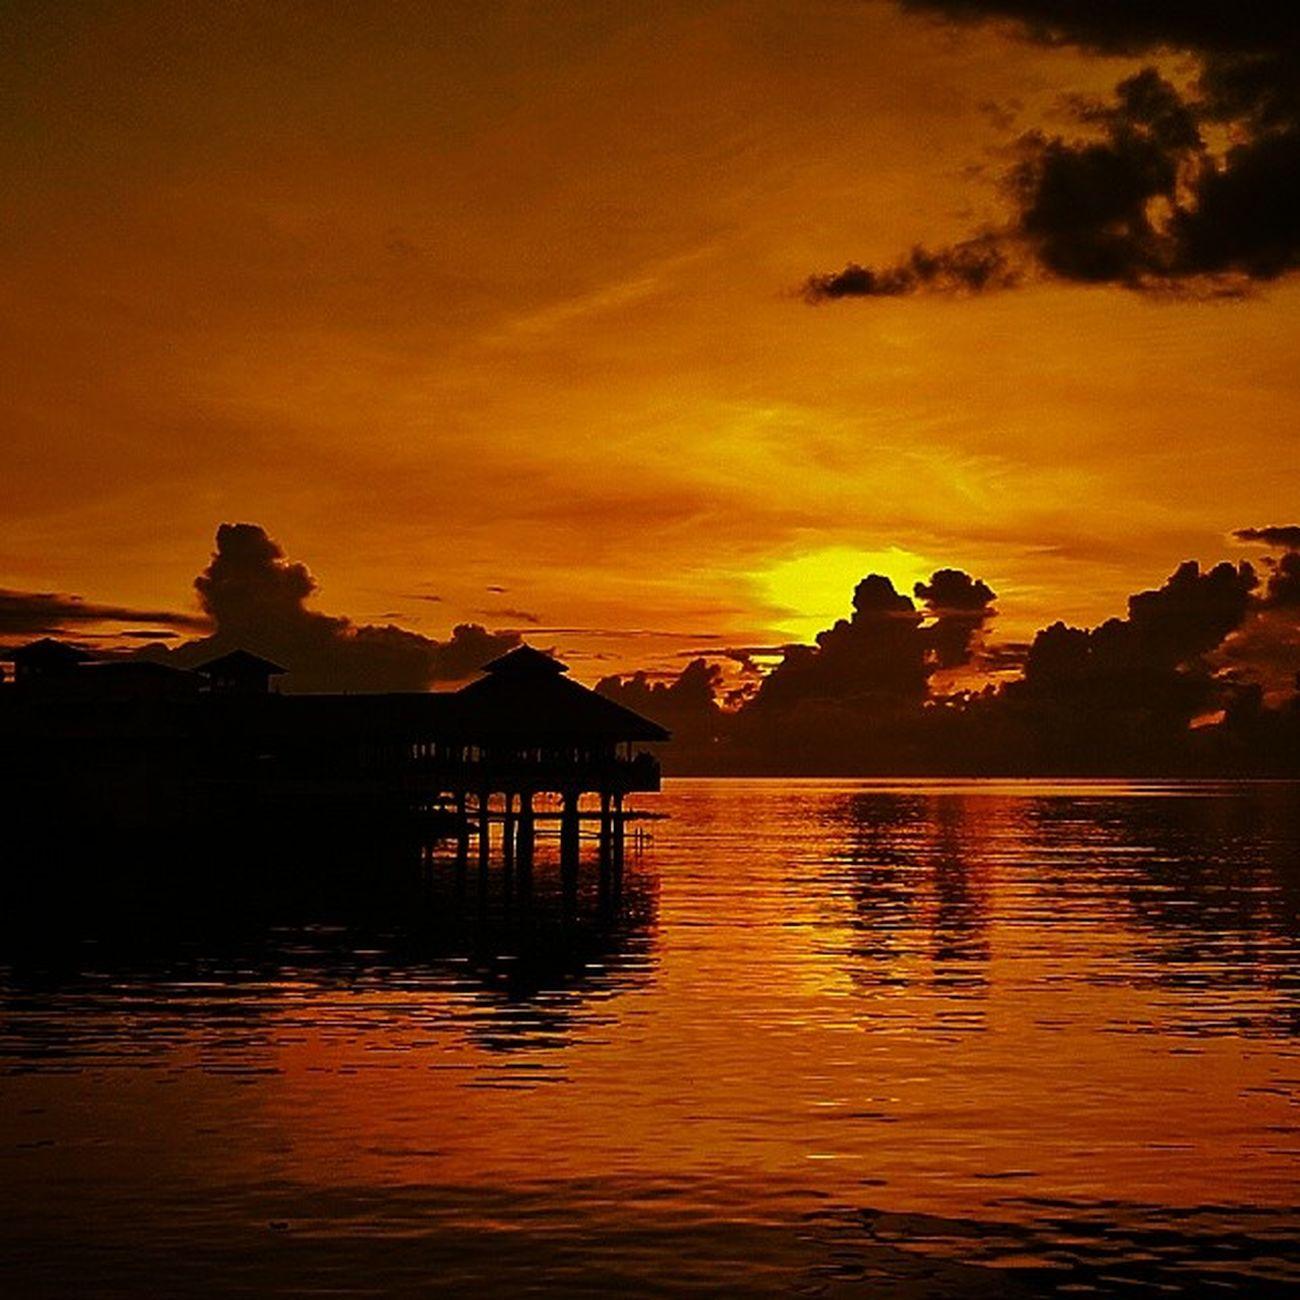 Here comes the sun(set).. Du..du..du..du - The Beatles Boulevard Manado Upload bersama @instanusantara Inub456 Instanusantara Instanusantaramanado Sitoutimoutumoutou lovemanado iManado gangManado FotoVasung sunset Beautiful SkyPorn beach boulevard PhonePhotography Lenovo K860